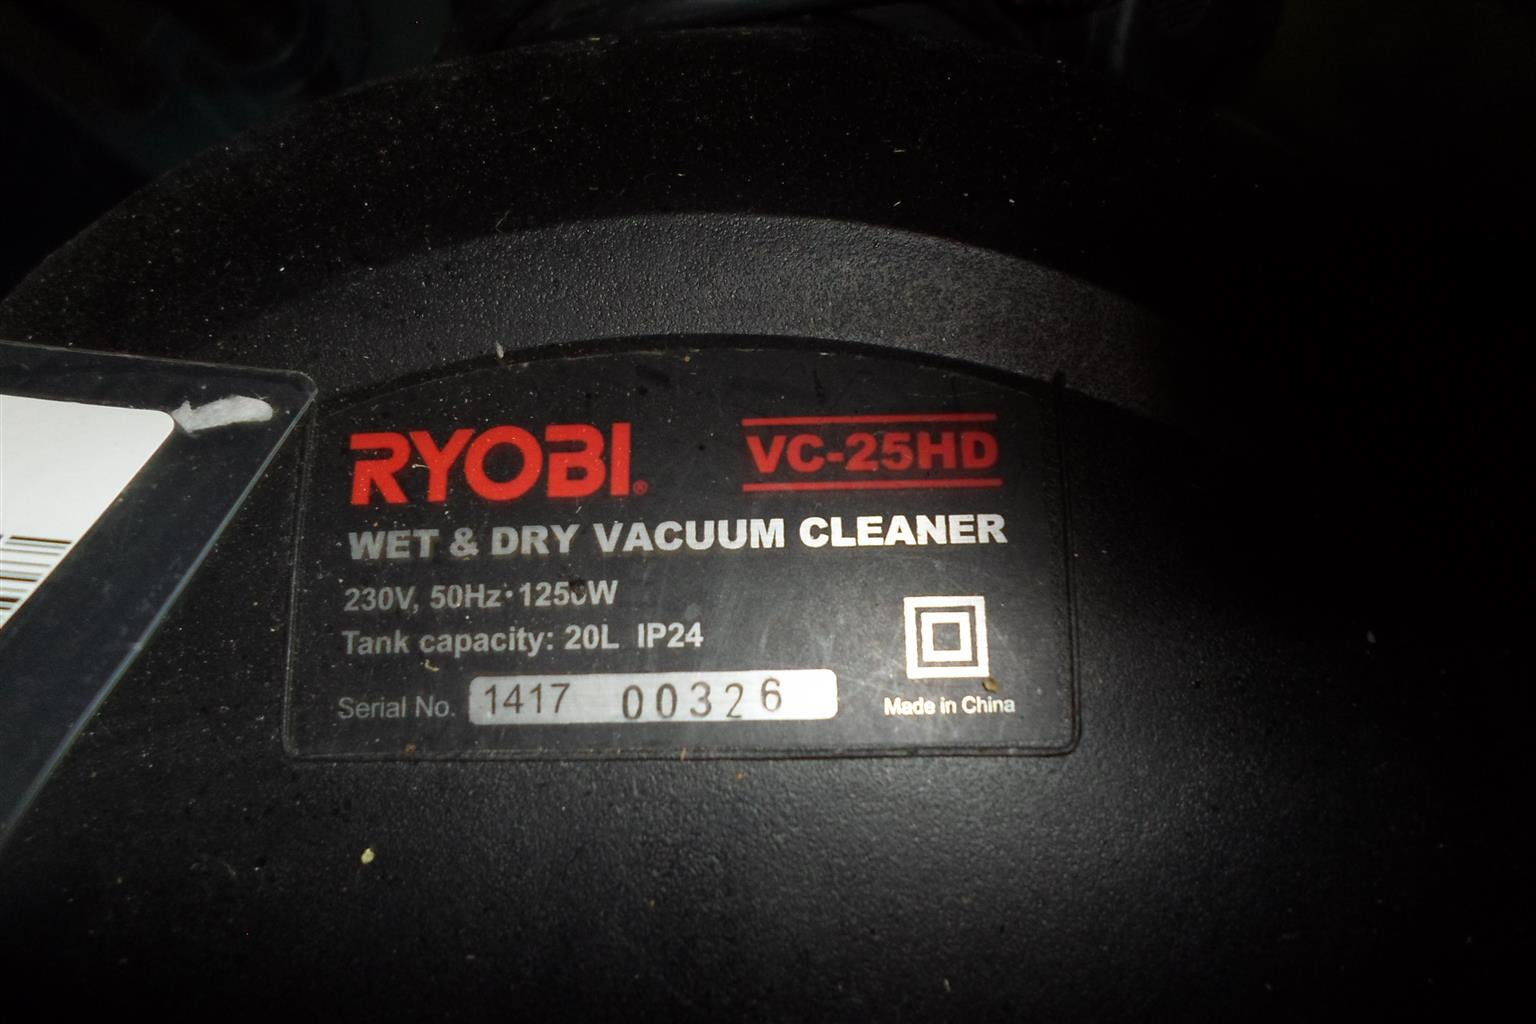 1250W Ryobi VC-25HD Wet & Dry Vacuum Cleaner